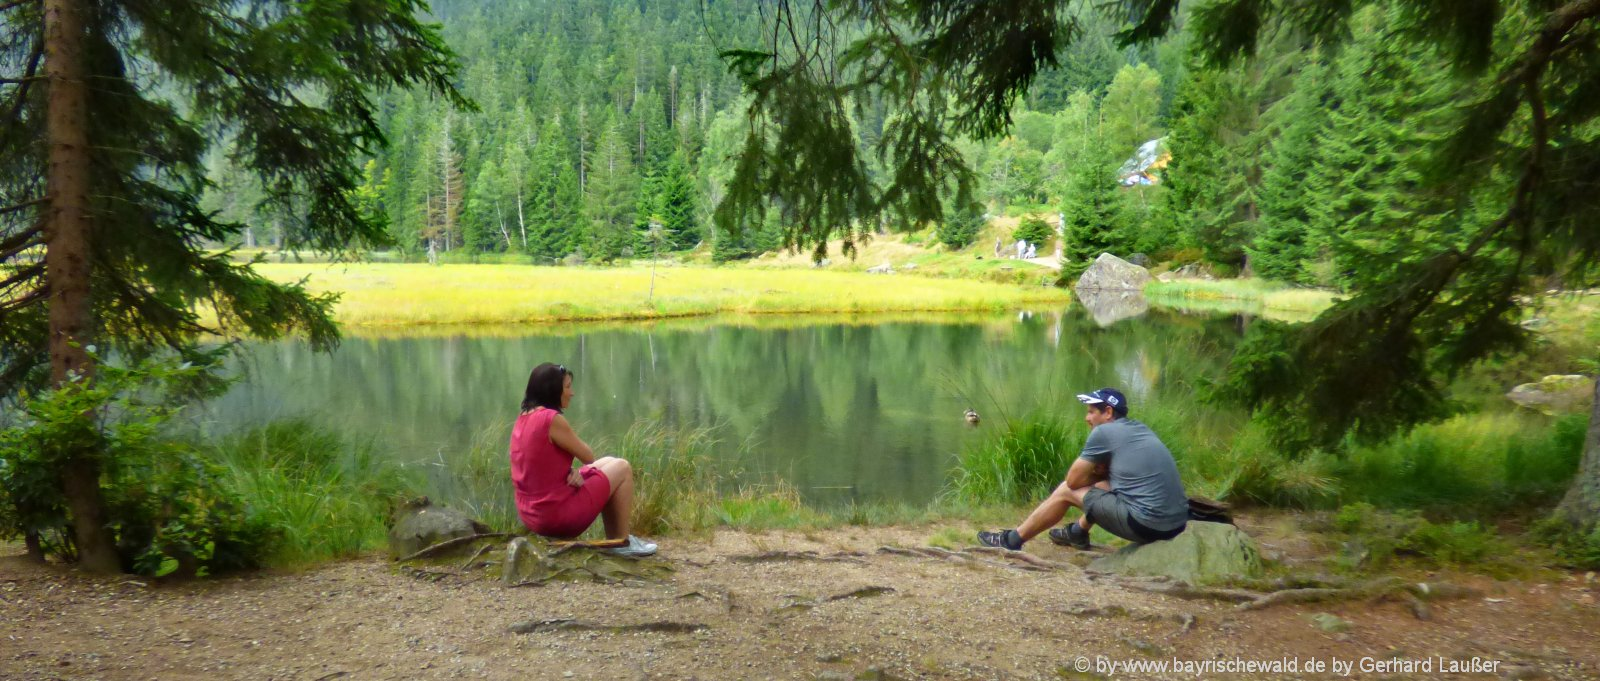 Erholungsurlaub im Landgasthof im Bayerwald